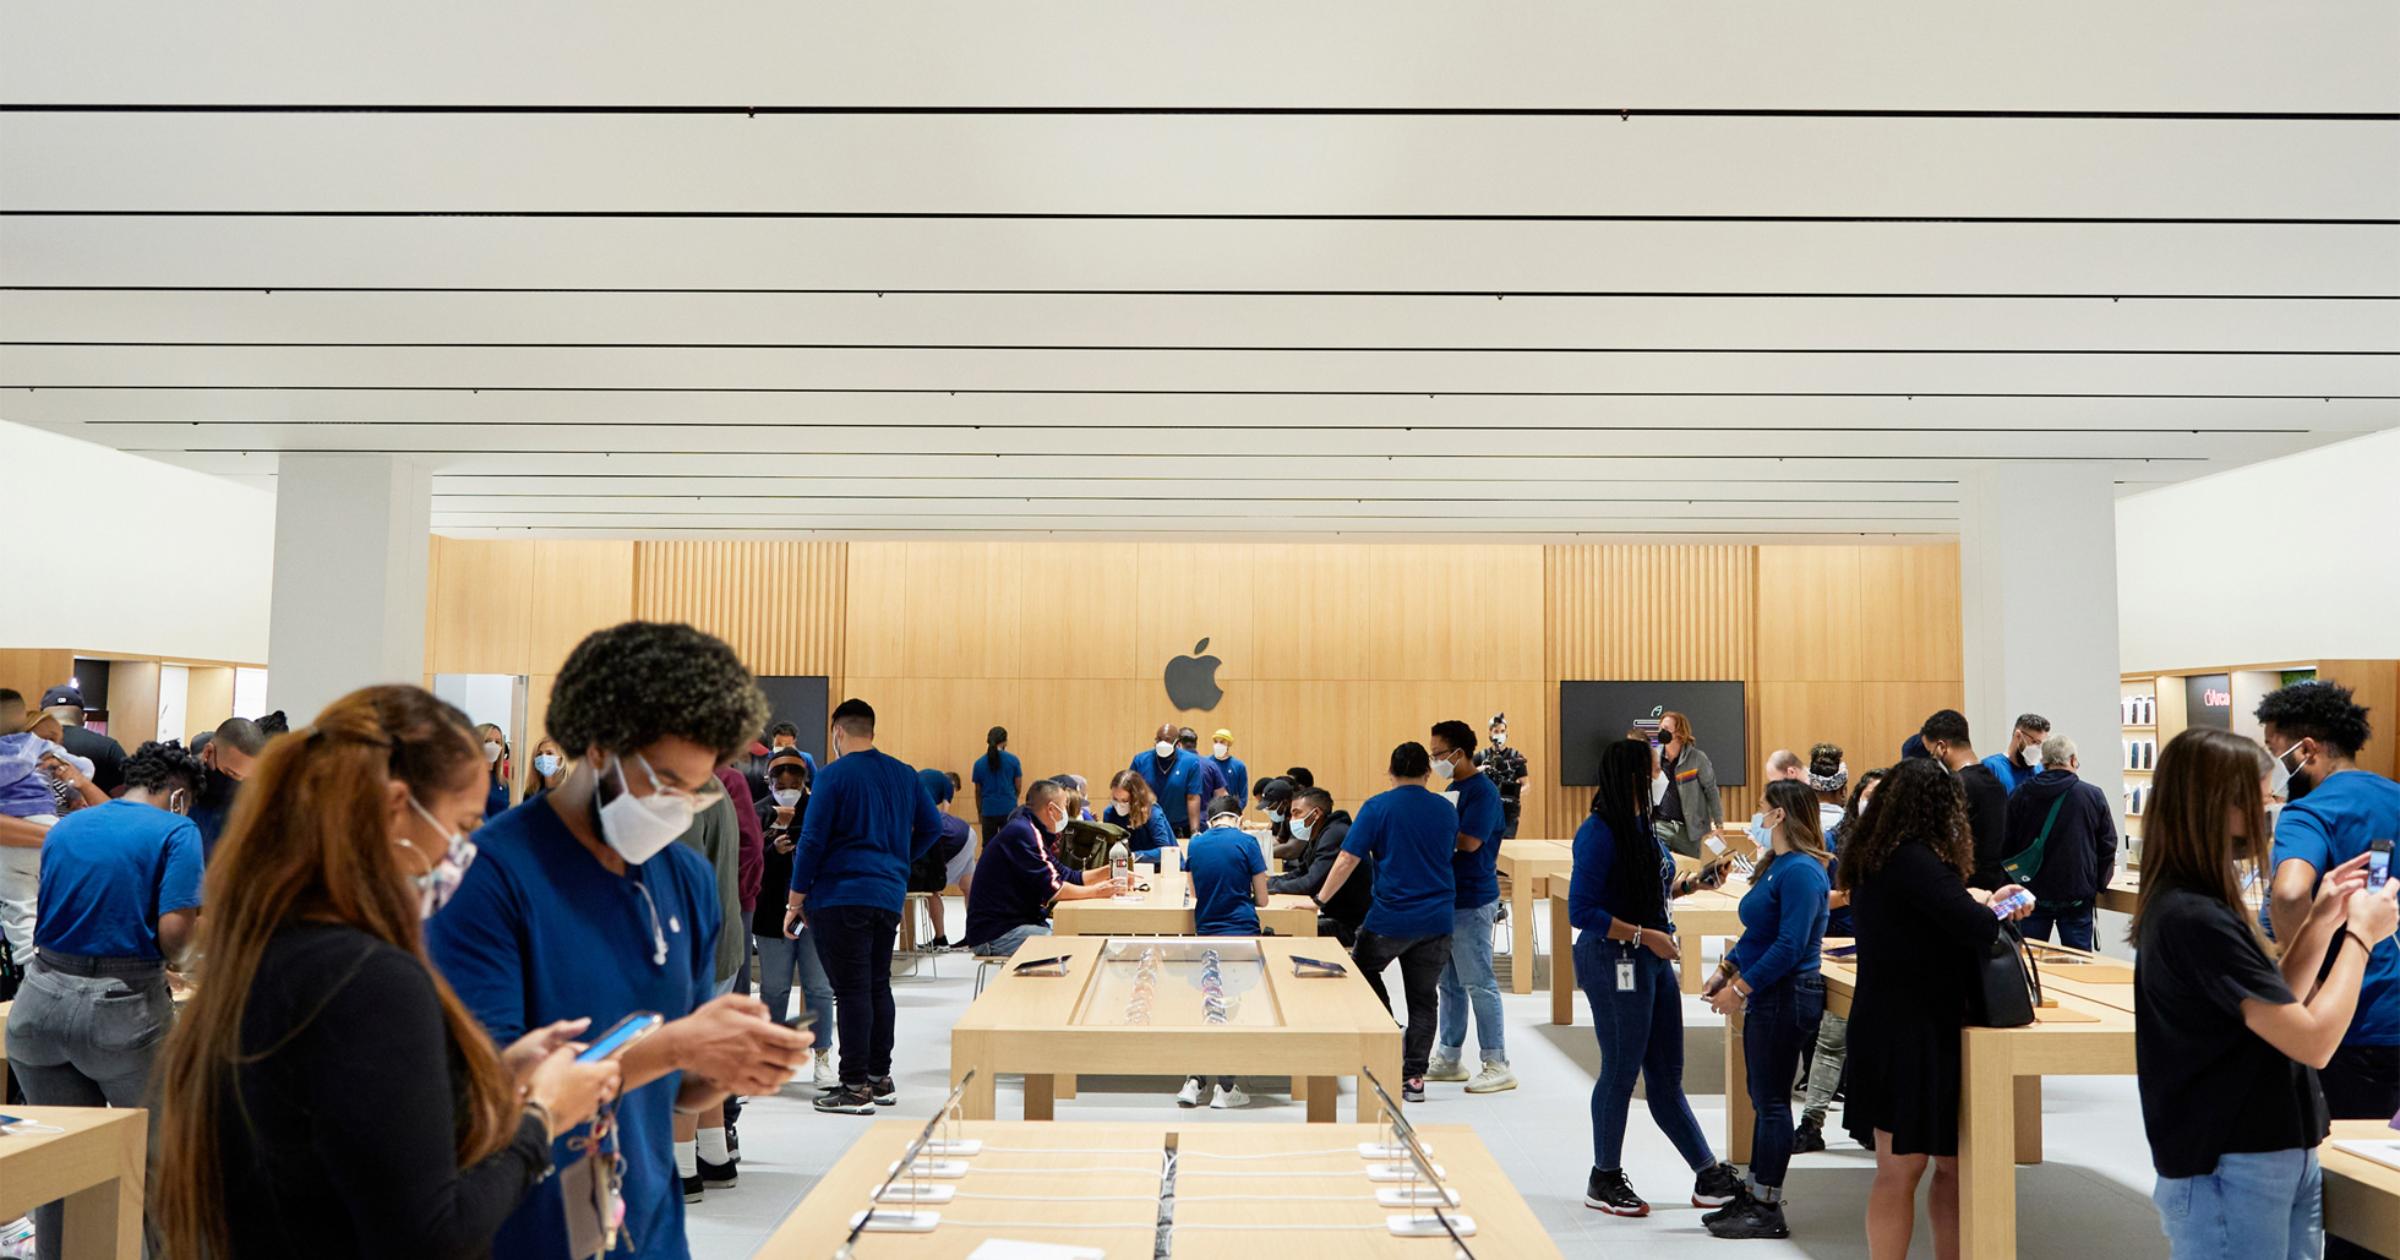 Apple Store The Bronx